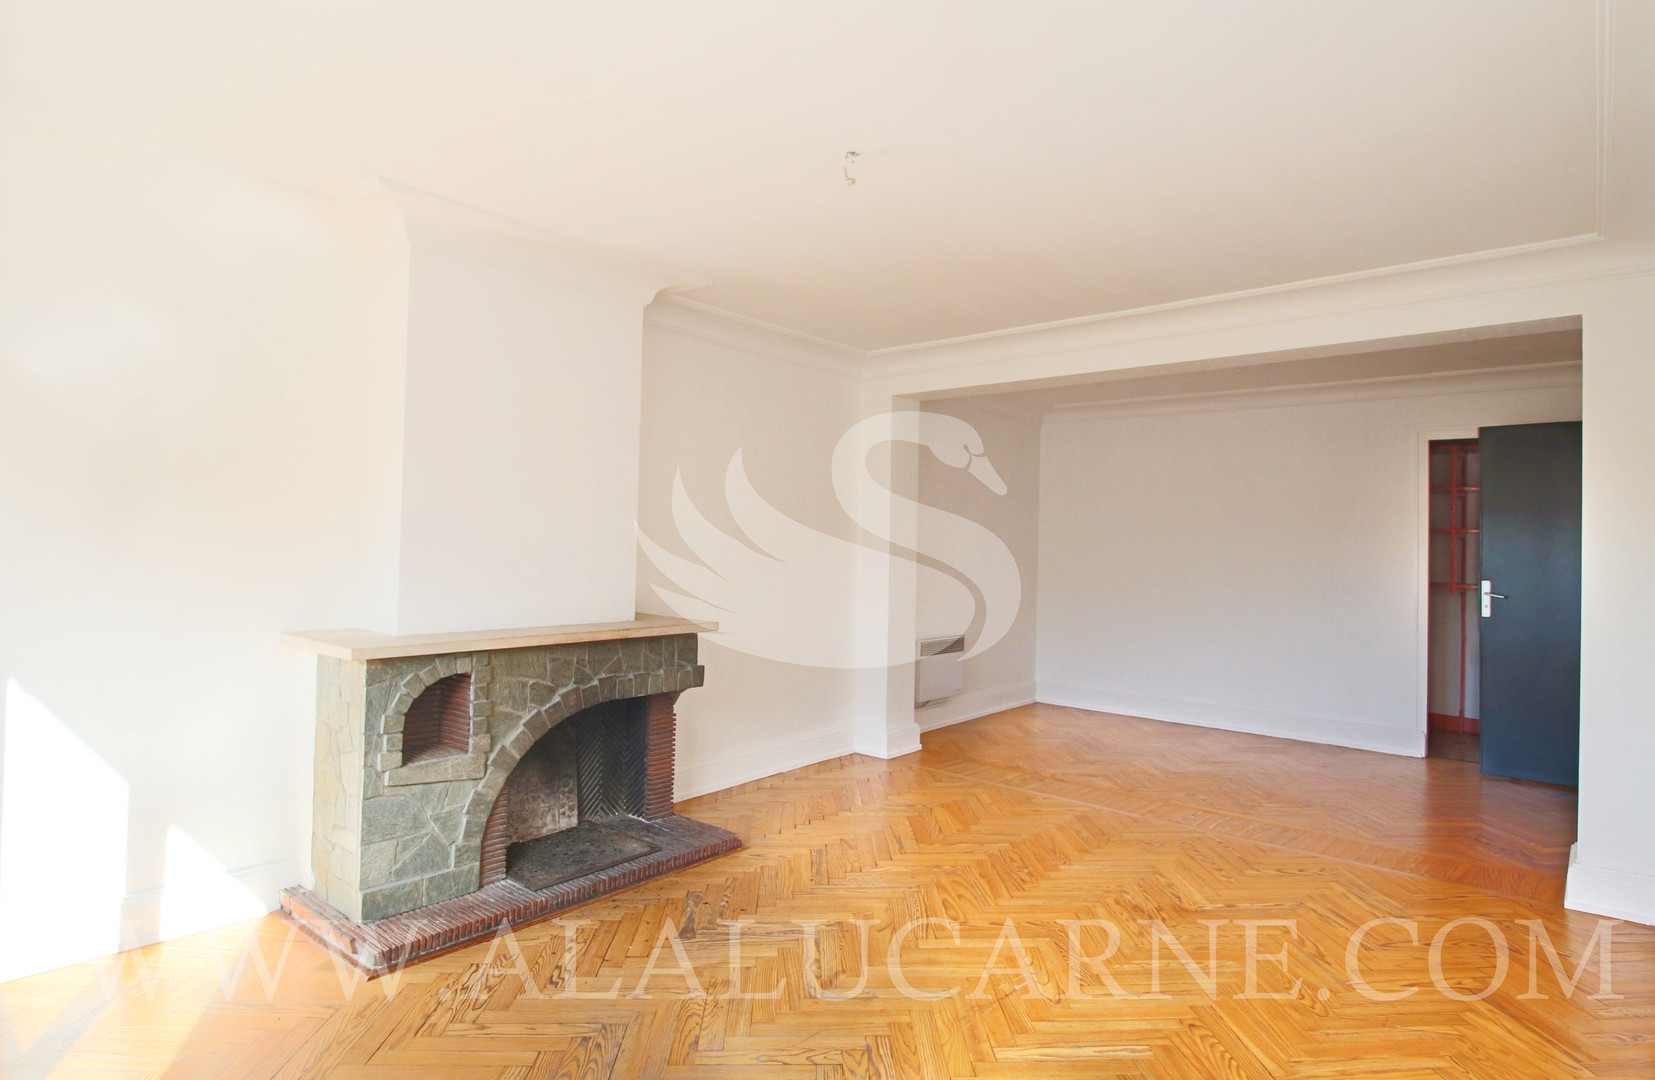 A vendre immeuble avec appartement.jpg